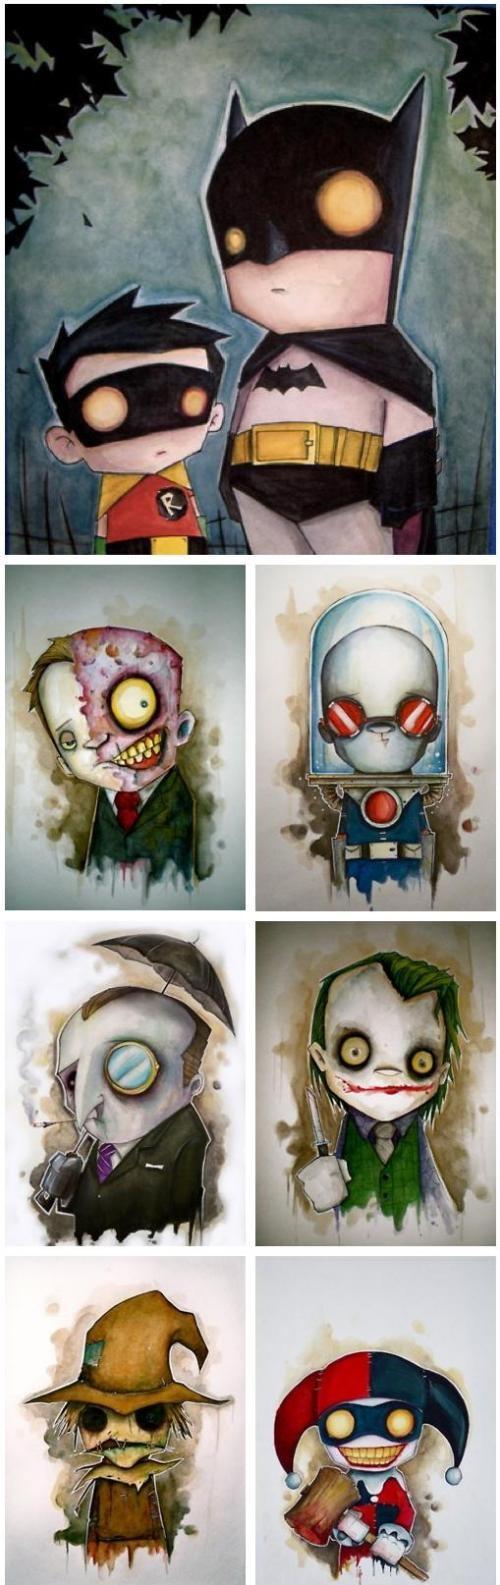 Superheros, reimagined.